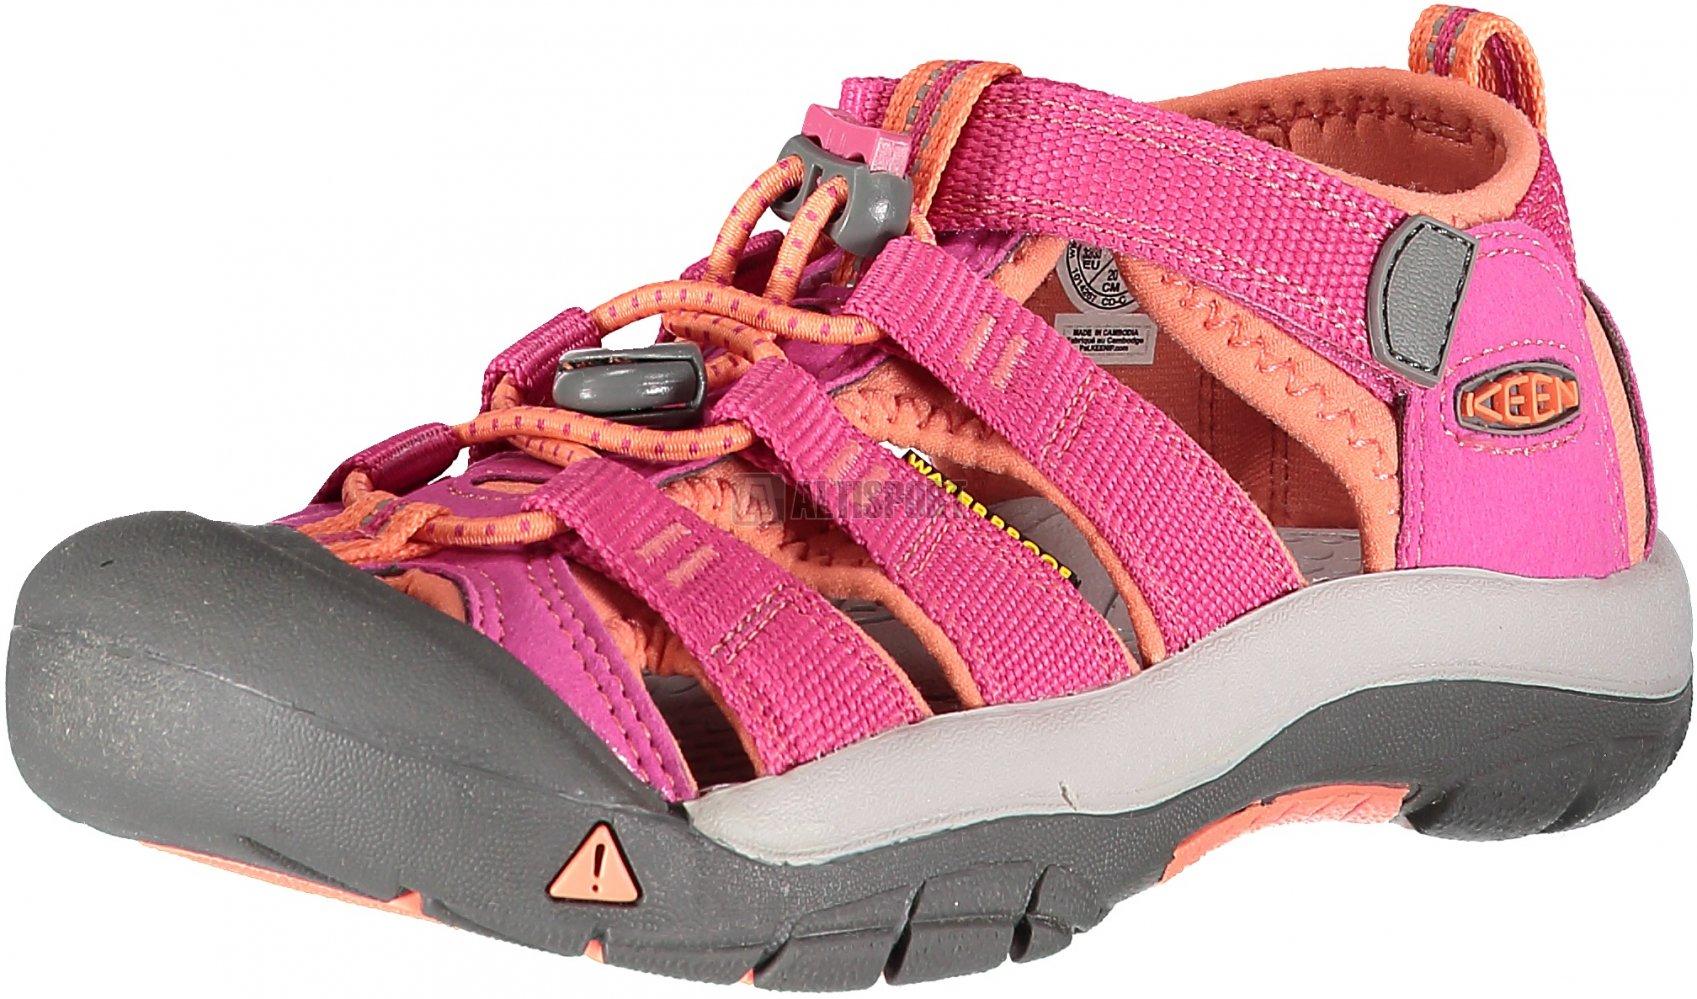 f3be688142a Dětské sandále KEEN NEWPORT H2 JR VERY BERRY FUSION CORAL velikost ...